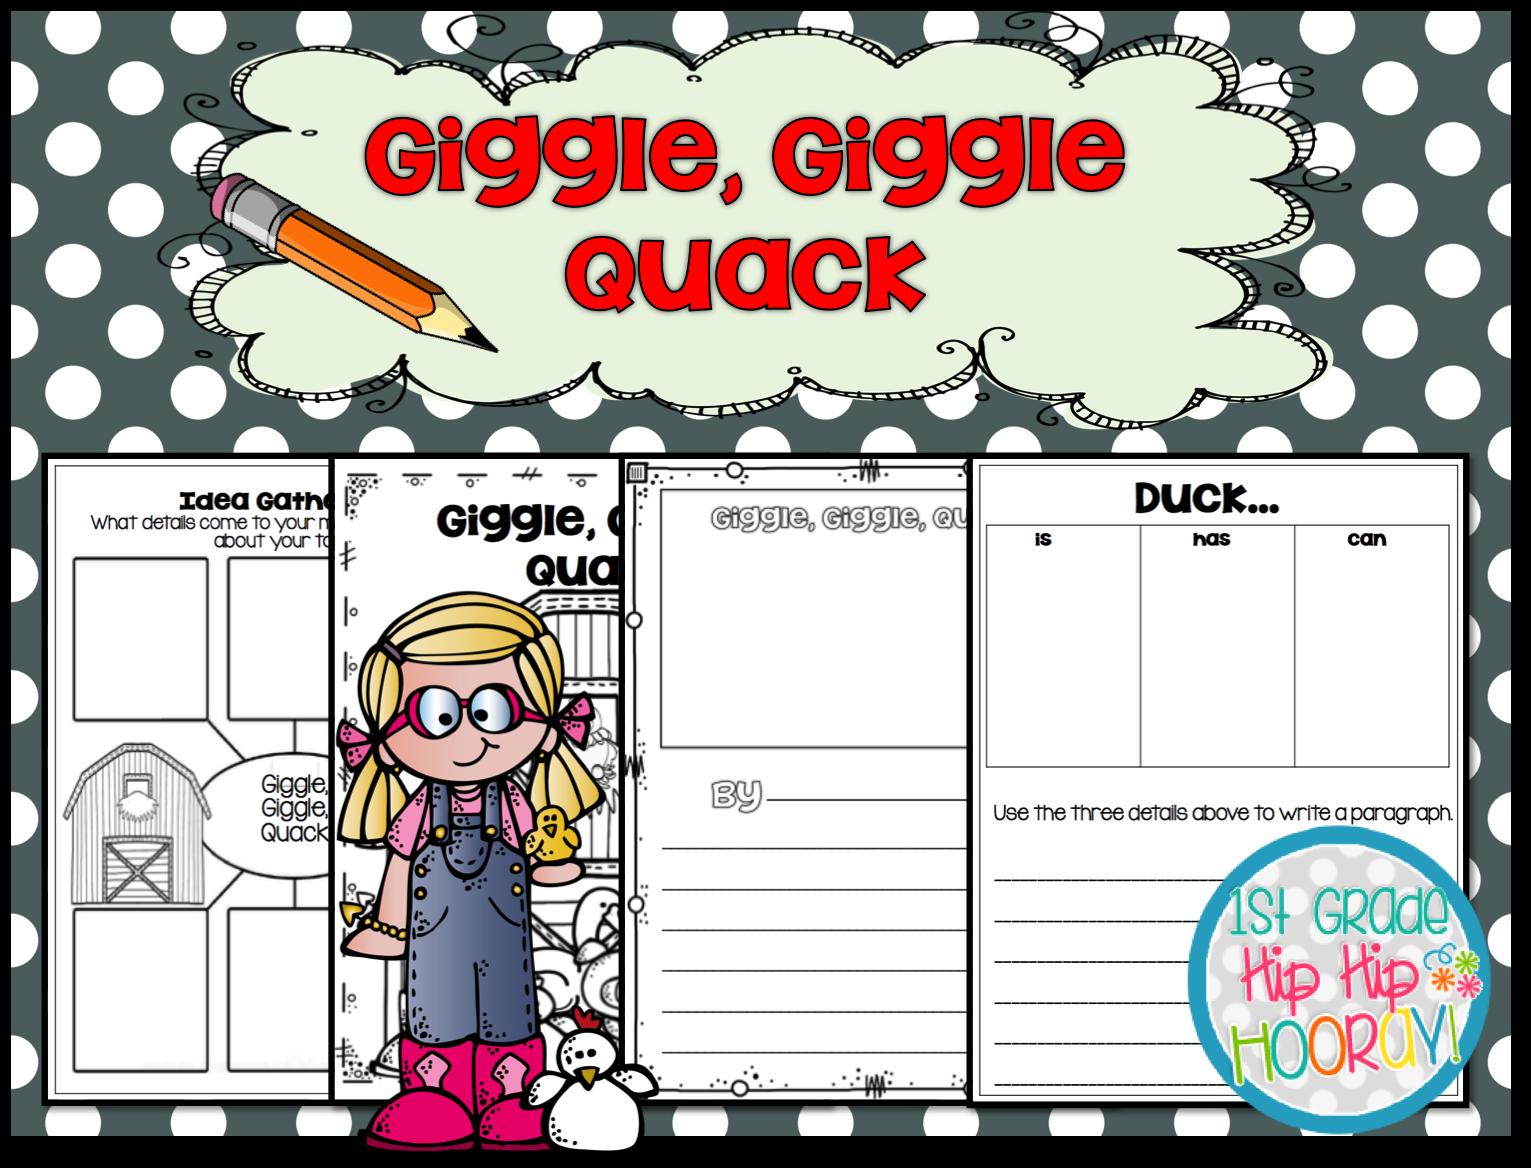 1st Grade Hip Hip Hooray Giggle Giggle Quack By Doreen